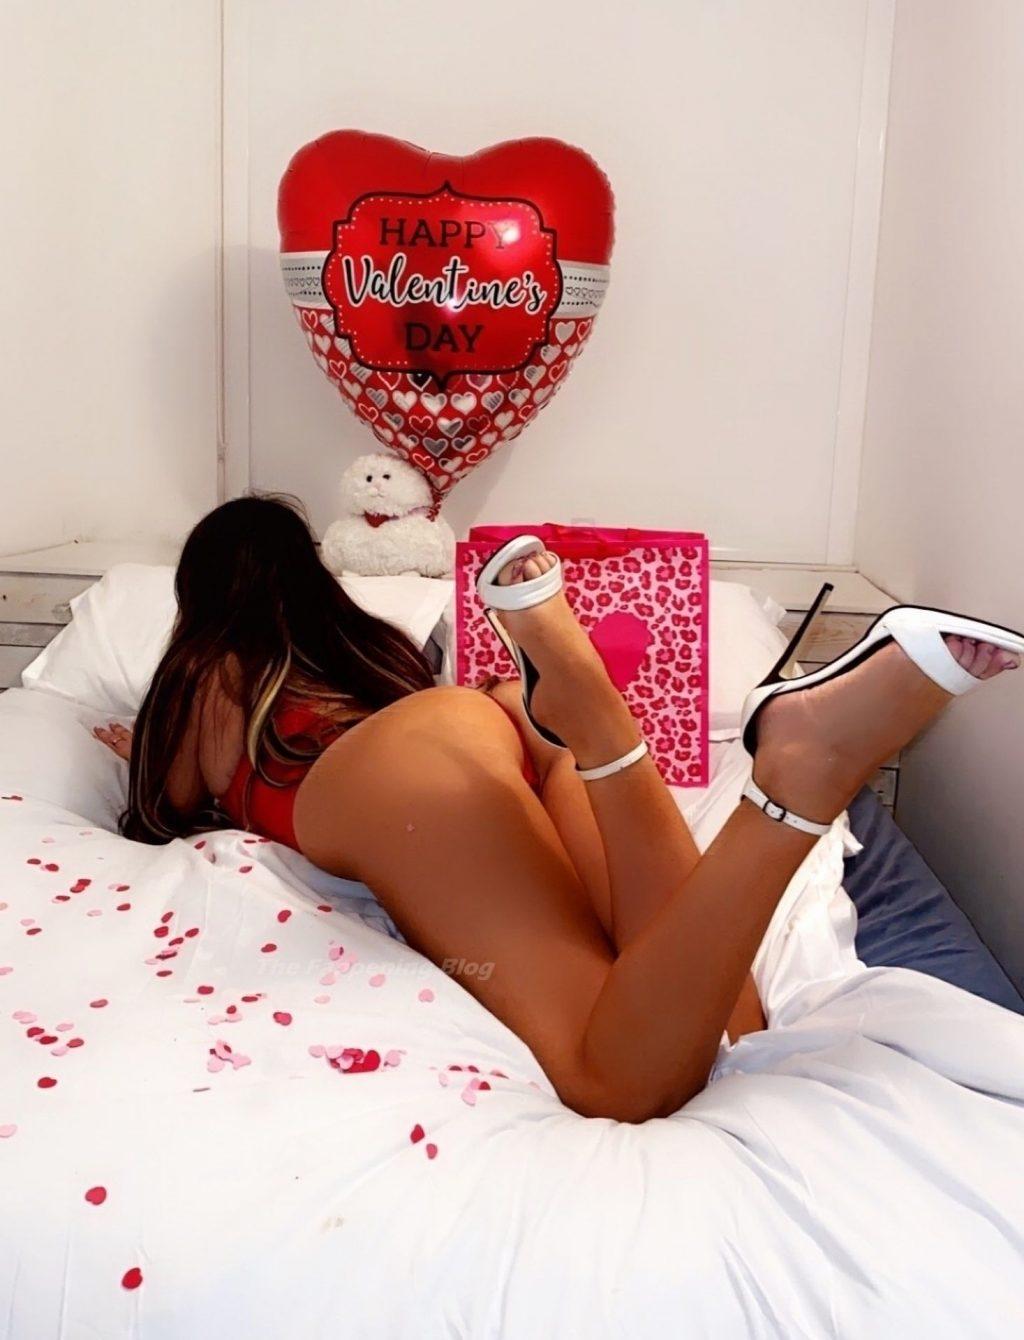 Claudia Romani Poses for Valentine's Day (8 Photos)